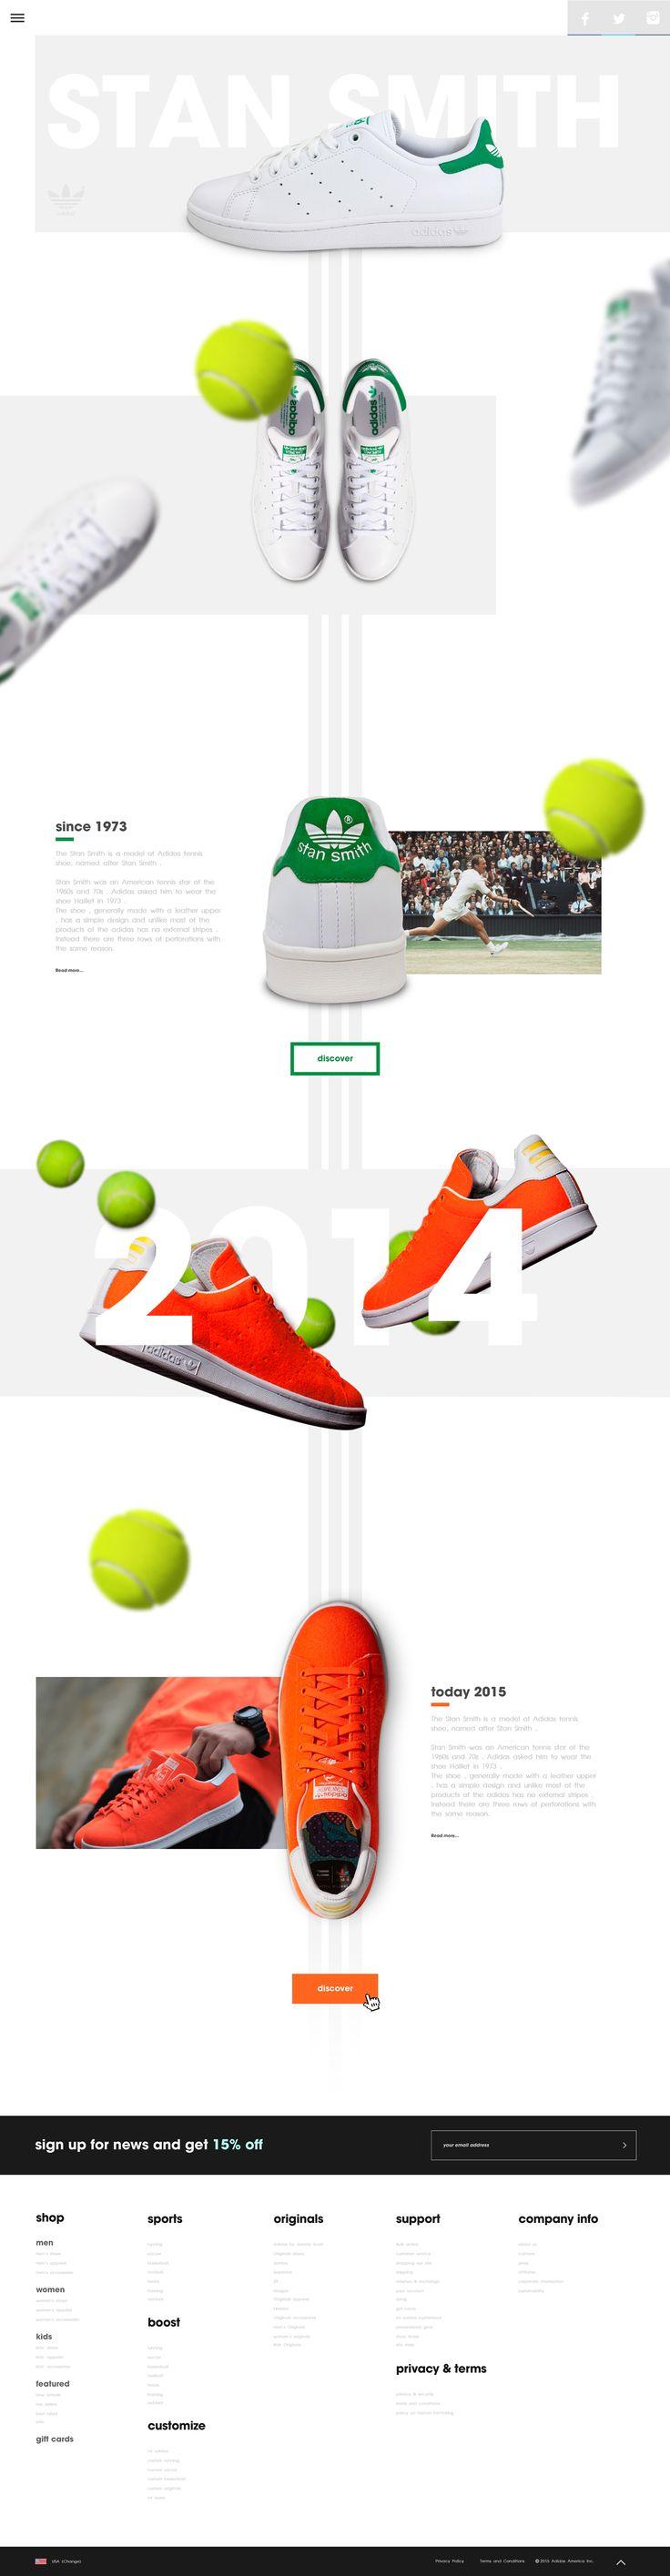 Adidas Web Web Design Adidas | 7cdd556 - burpimmunitet.website